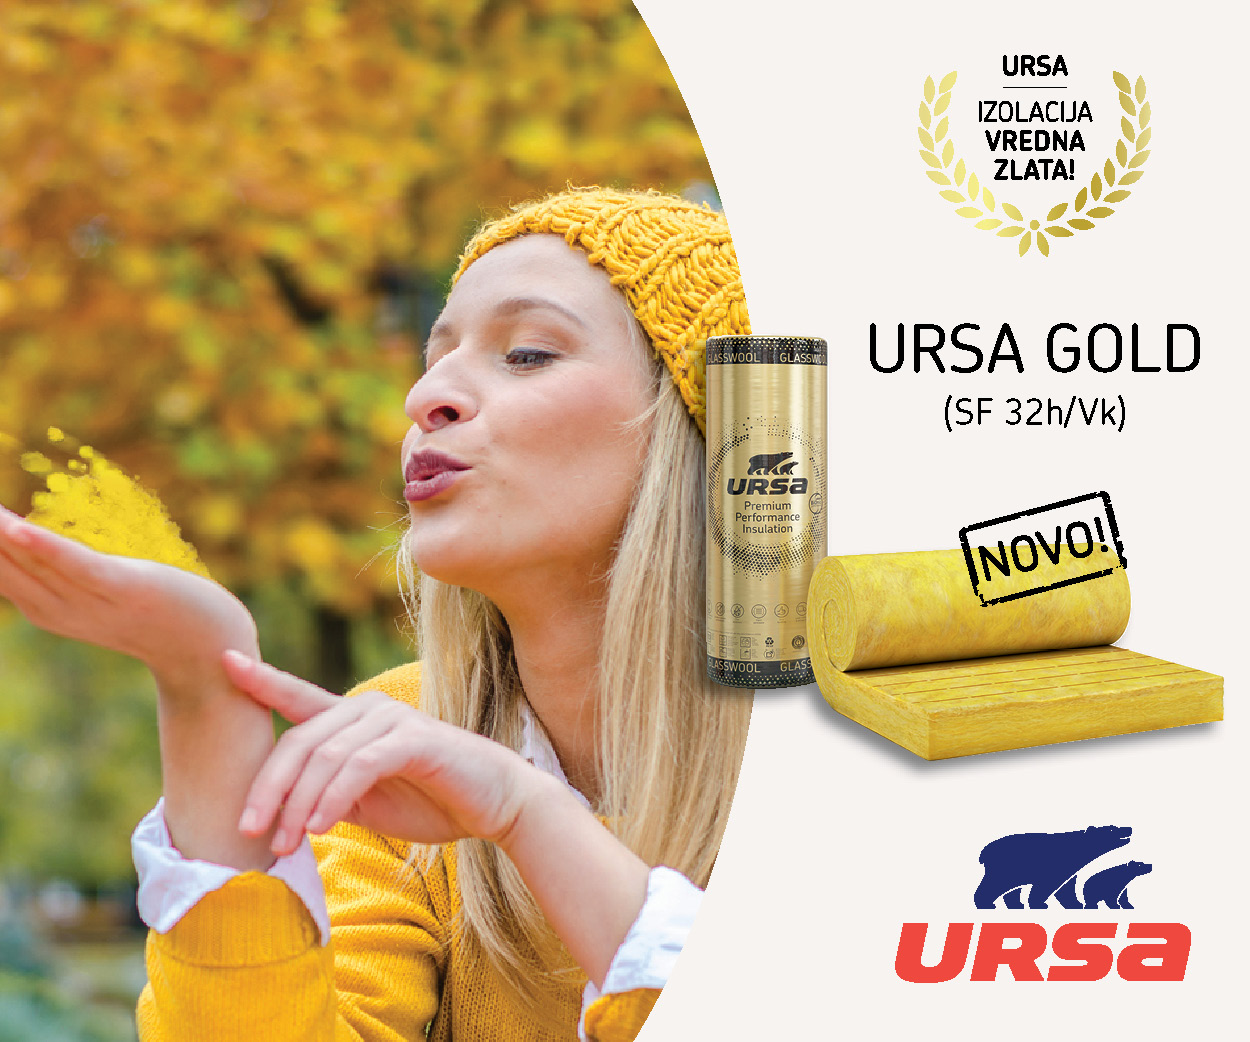 ursa-1555059913.jpg